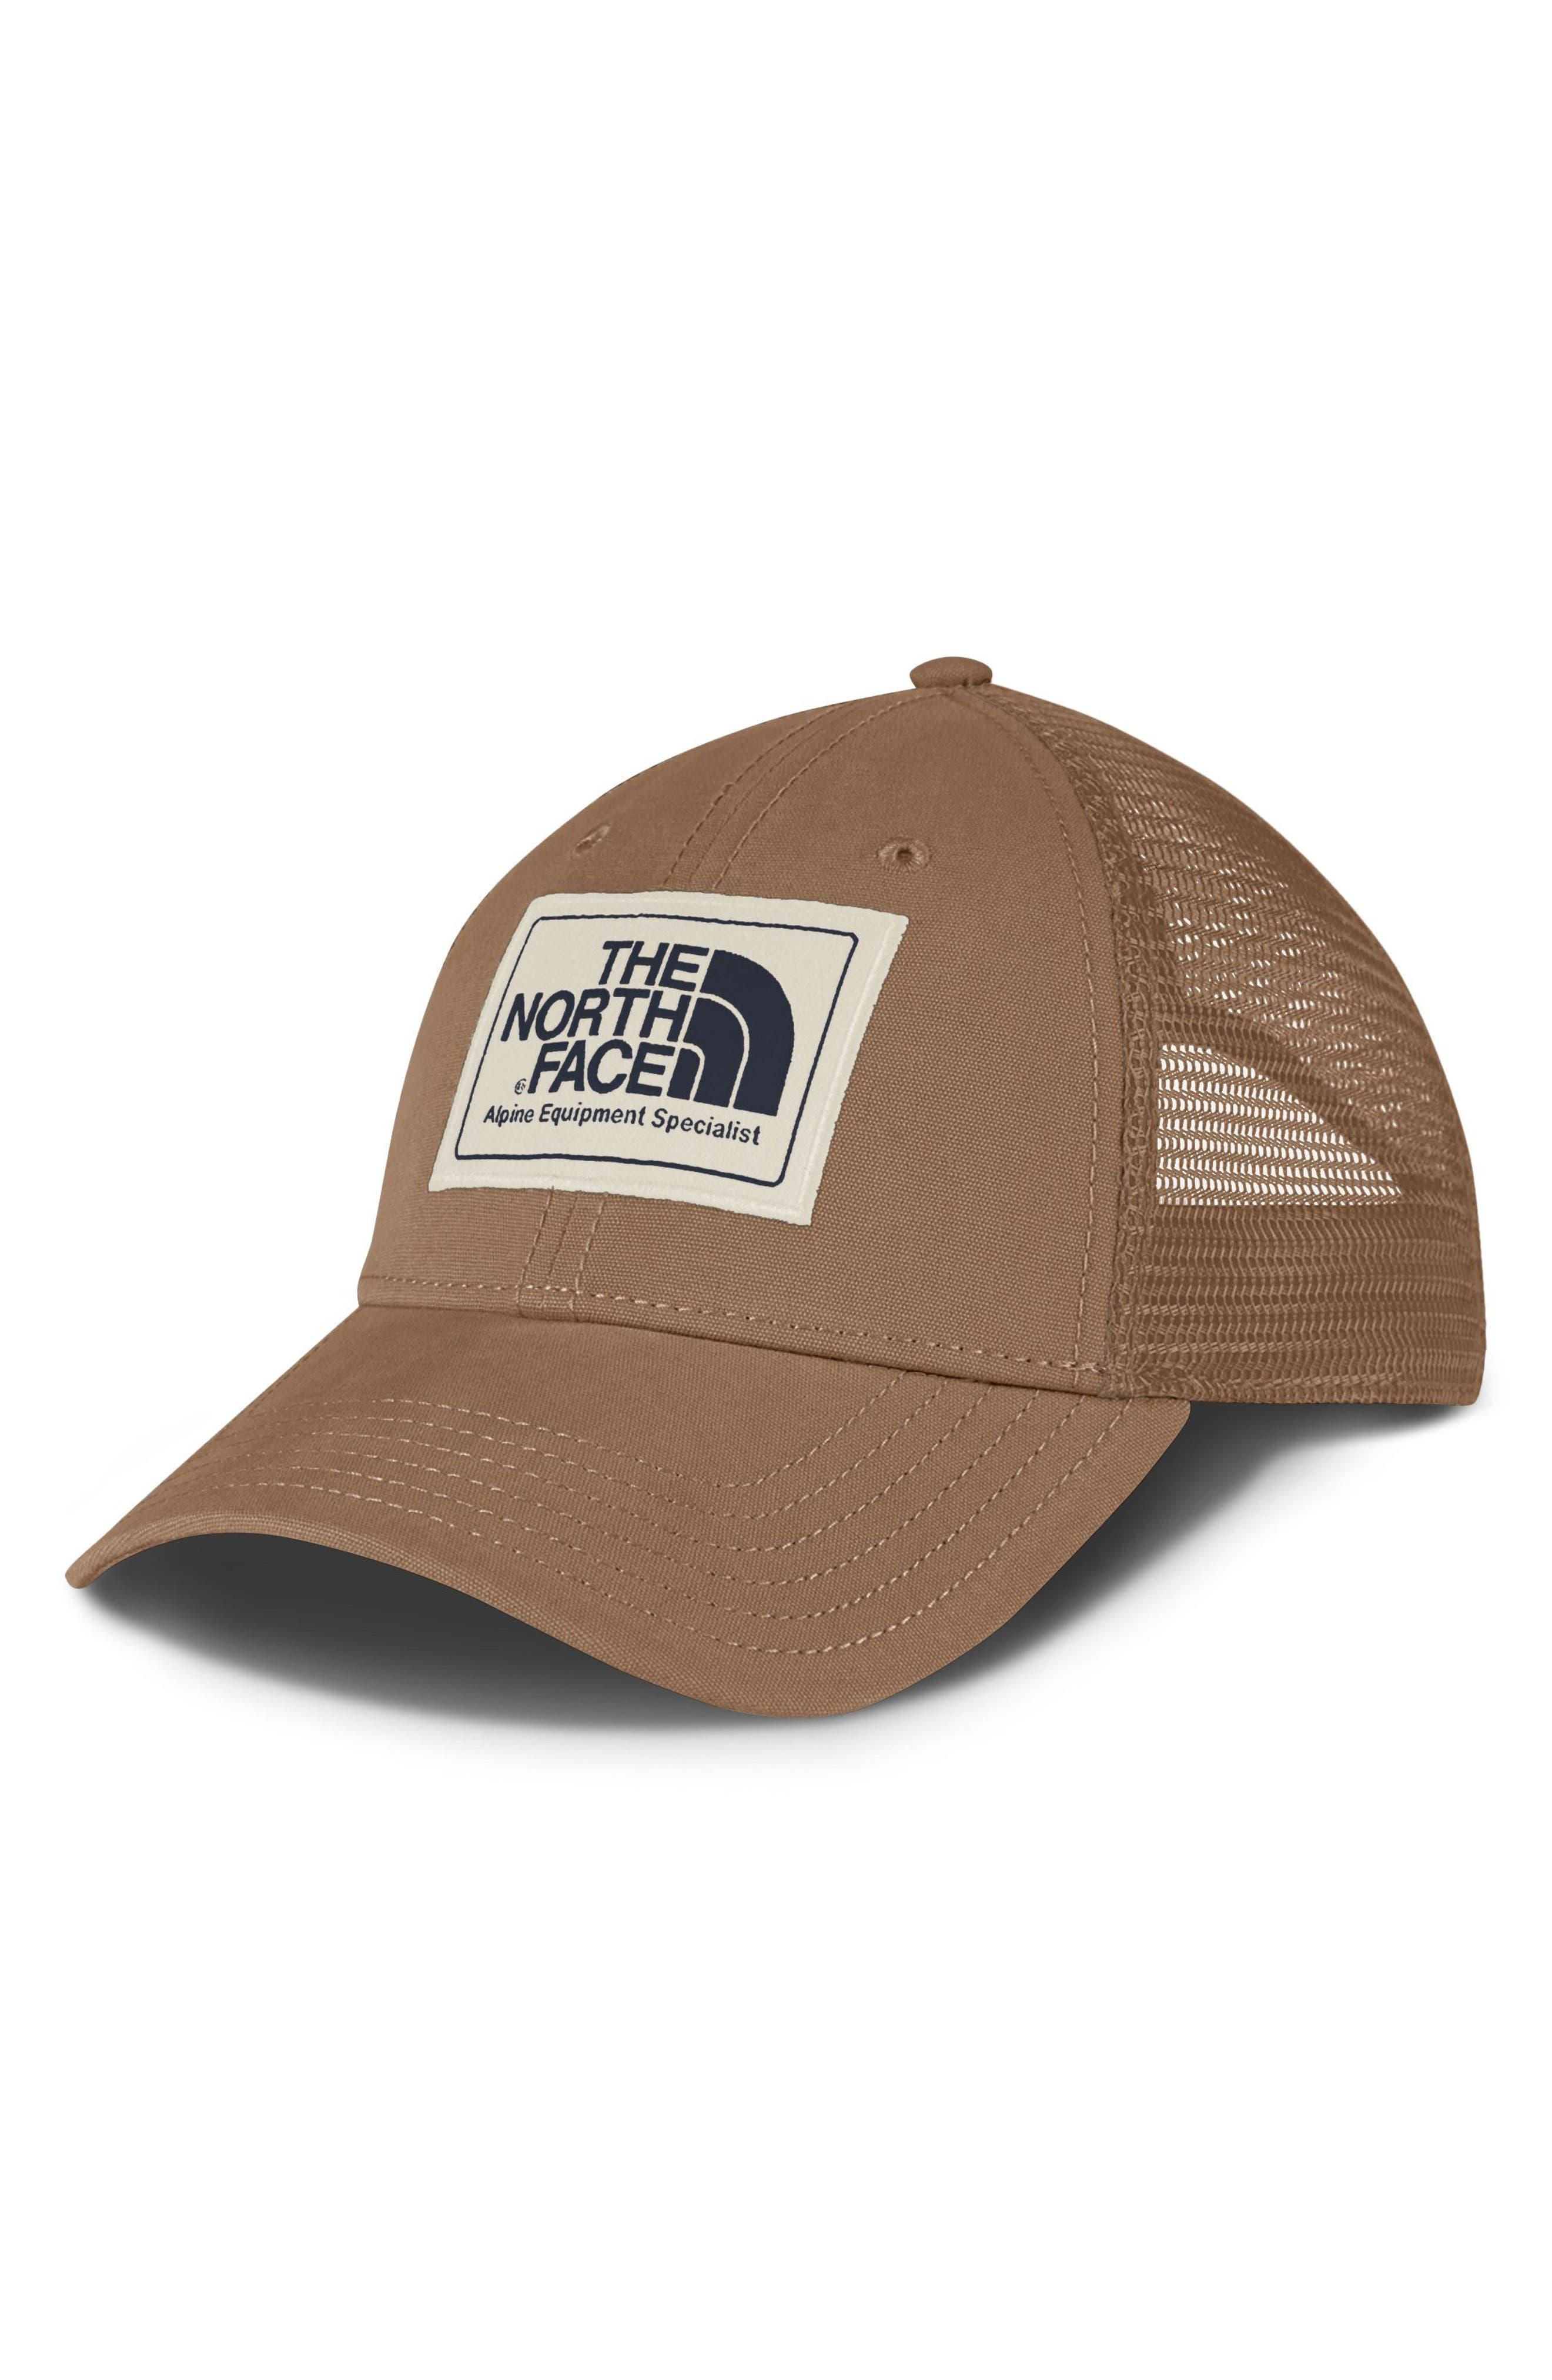 Mudder Trucker Hat,                             Main thumbnail 1, color,                             Khaki/ Vintage White/ Navy